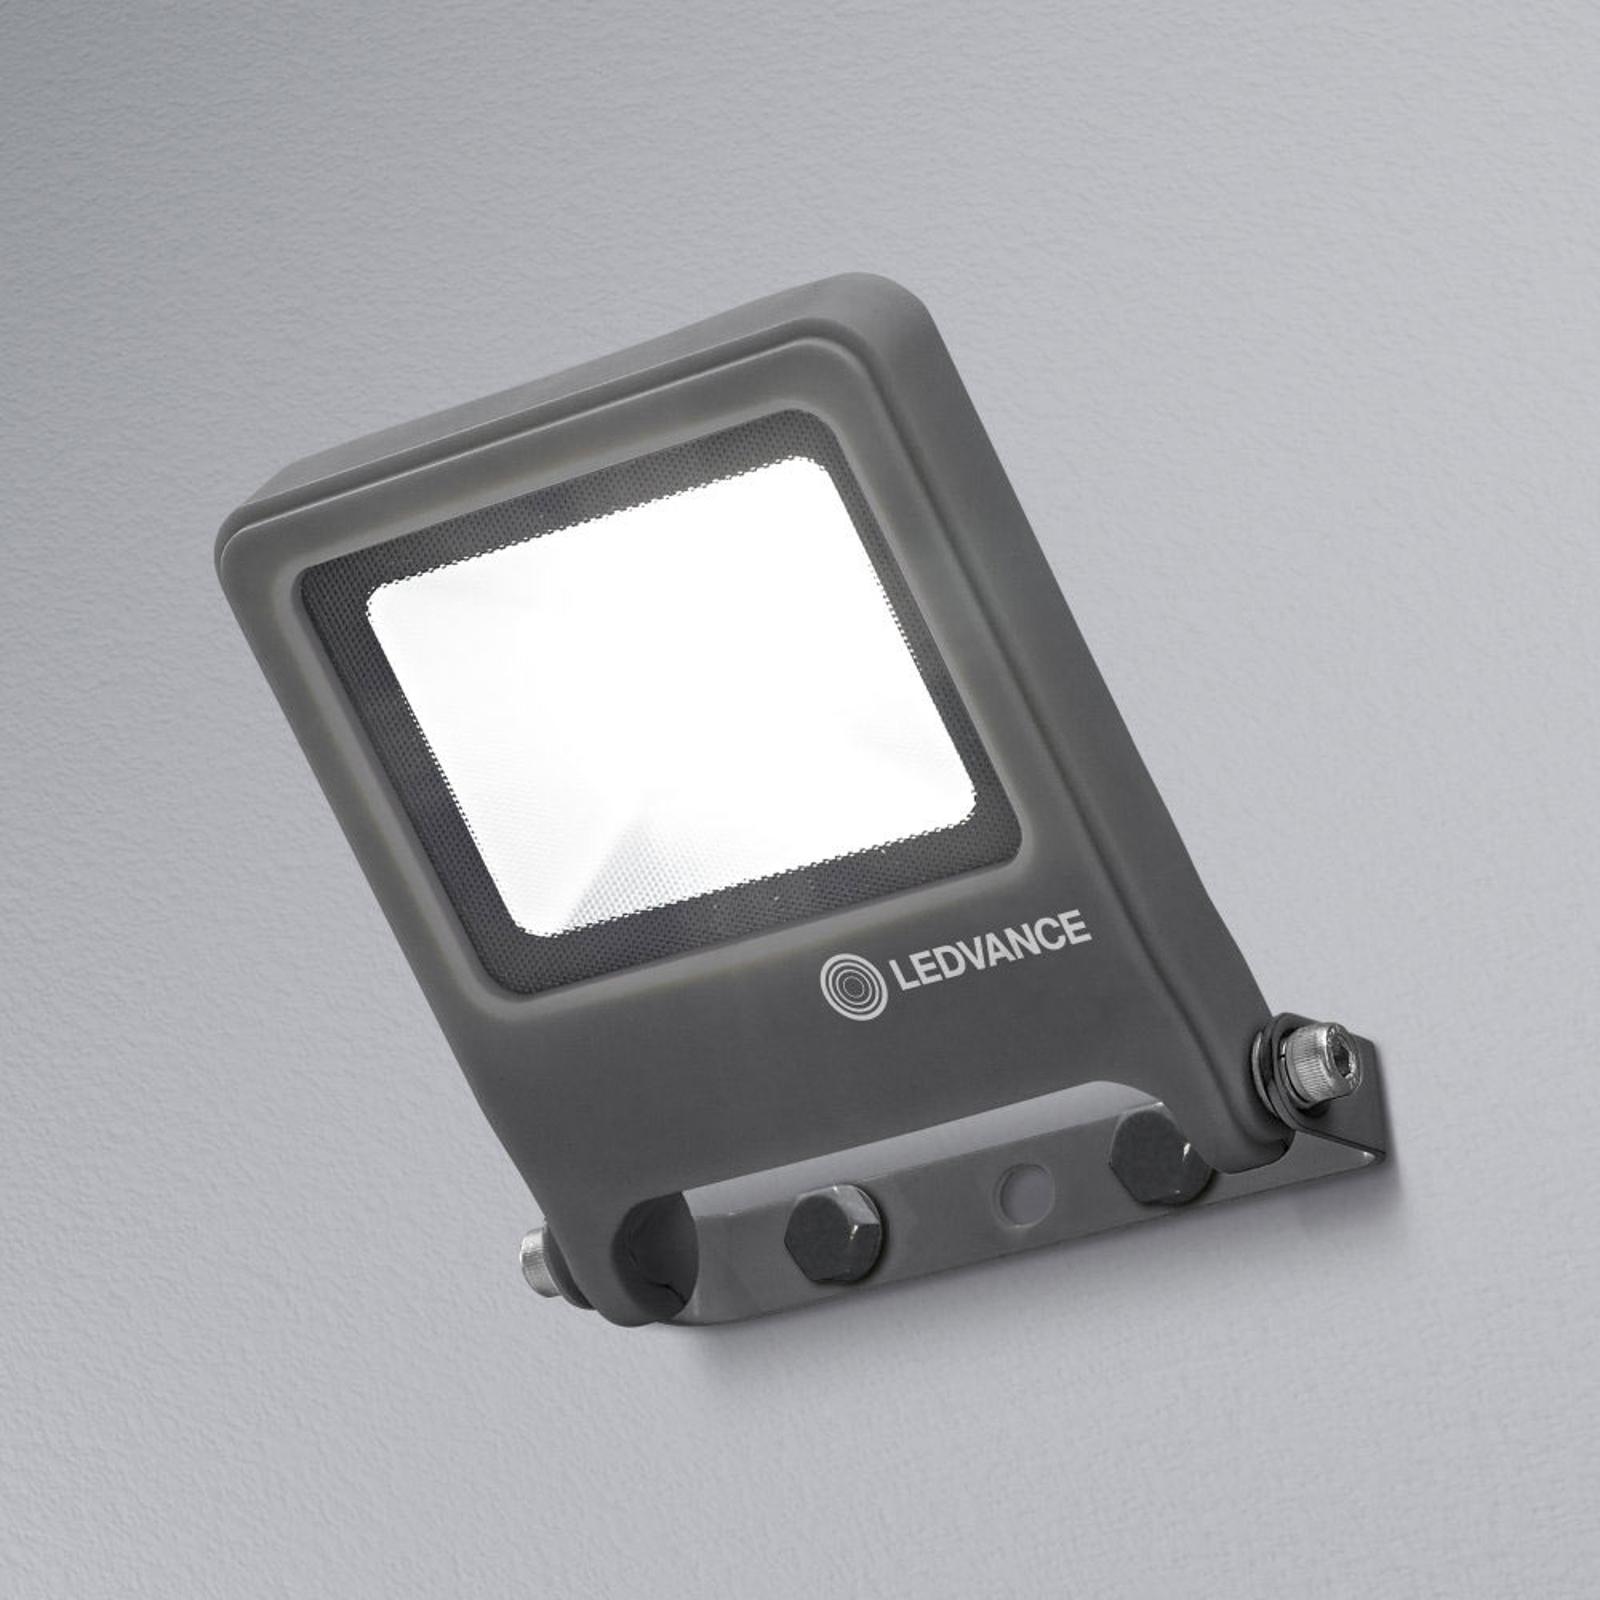 LEDVANCE Endura Floodlight LED buitenspot, 10 W